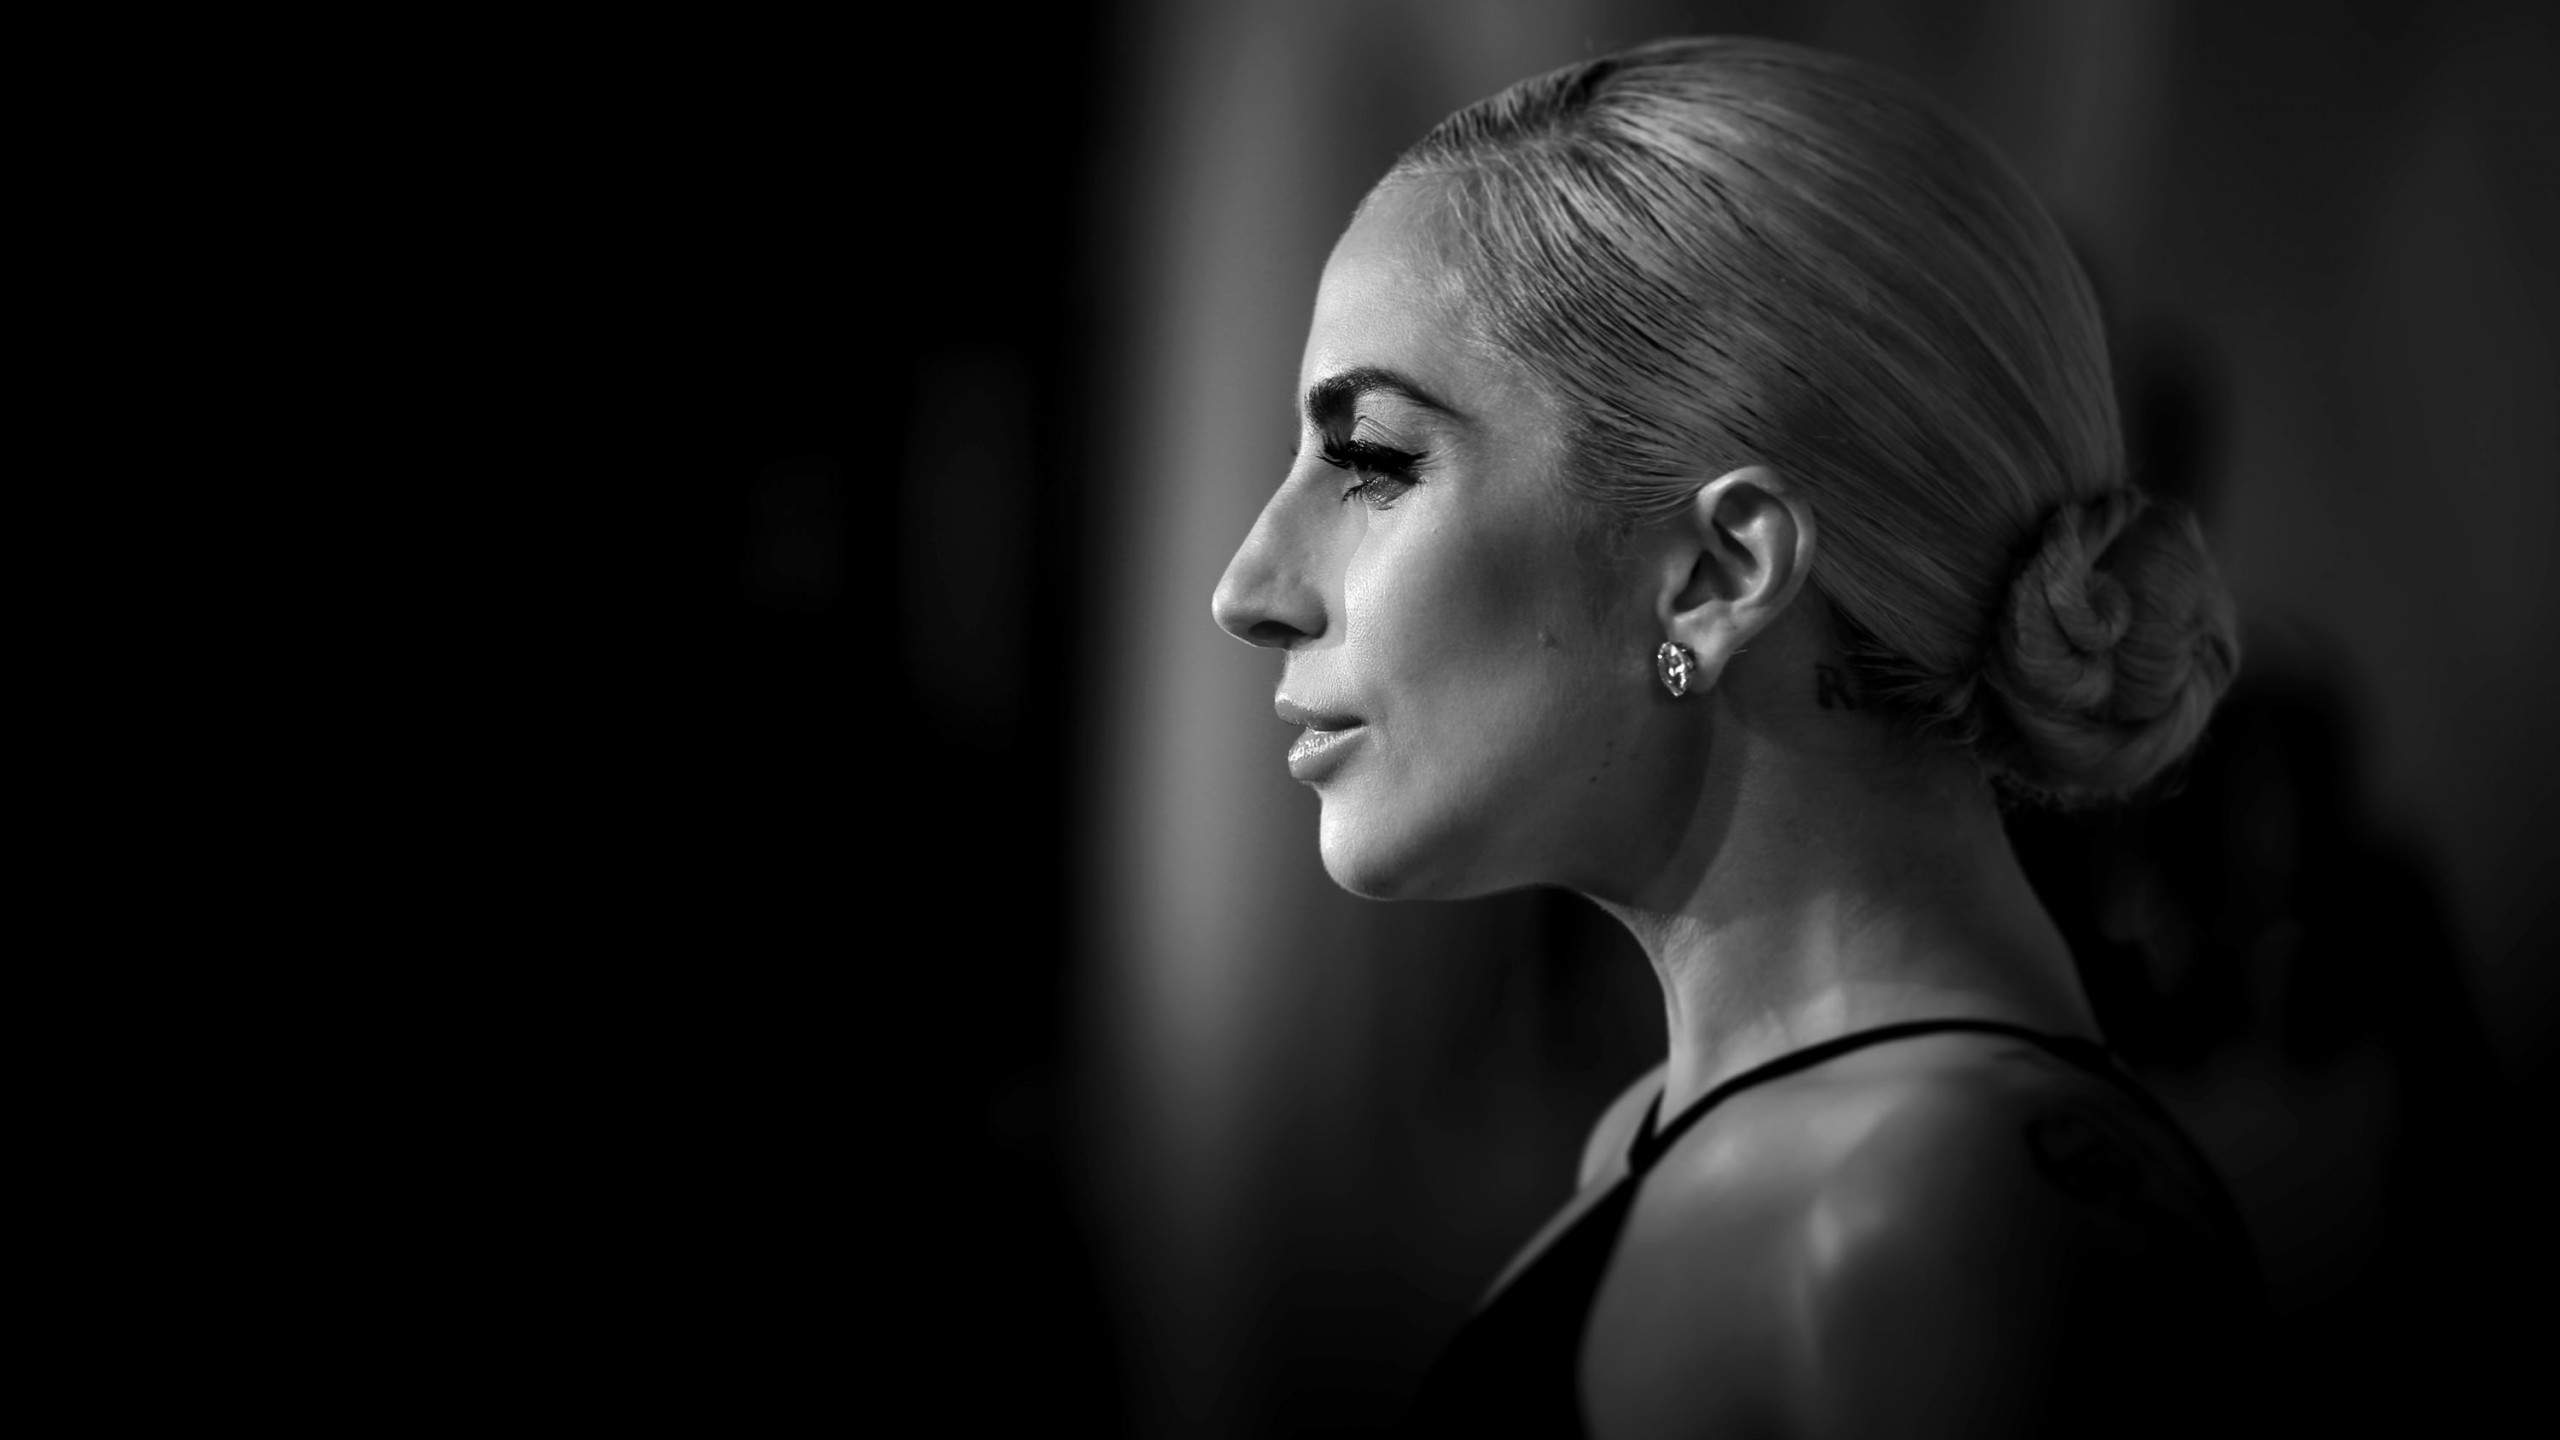 Wallpaper Lady Gaga Stefani Joanne Angelina Germanotta